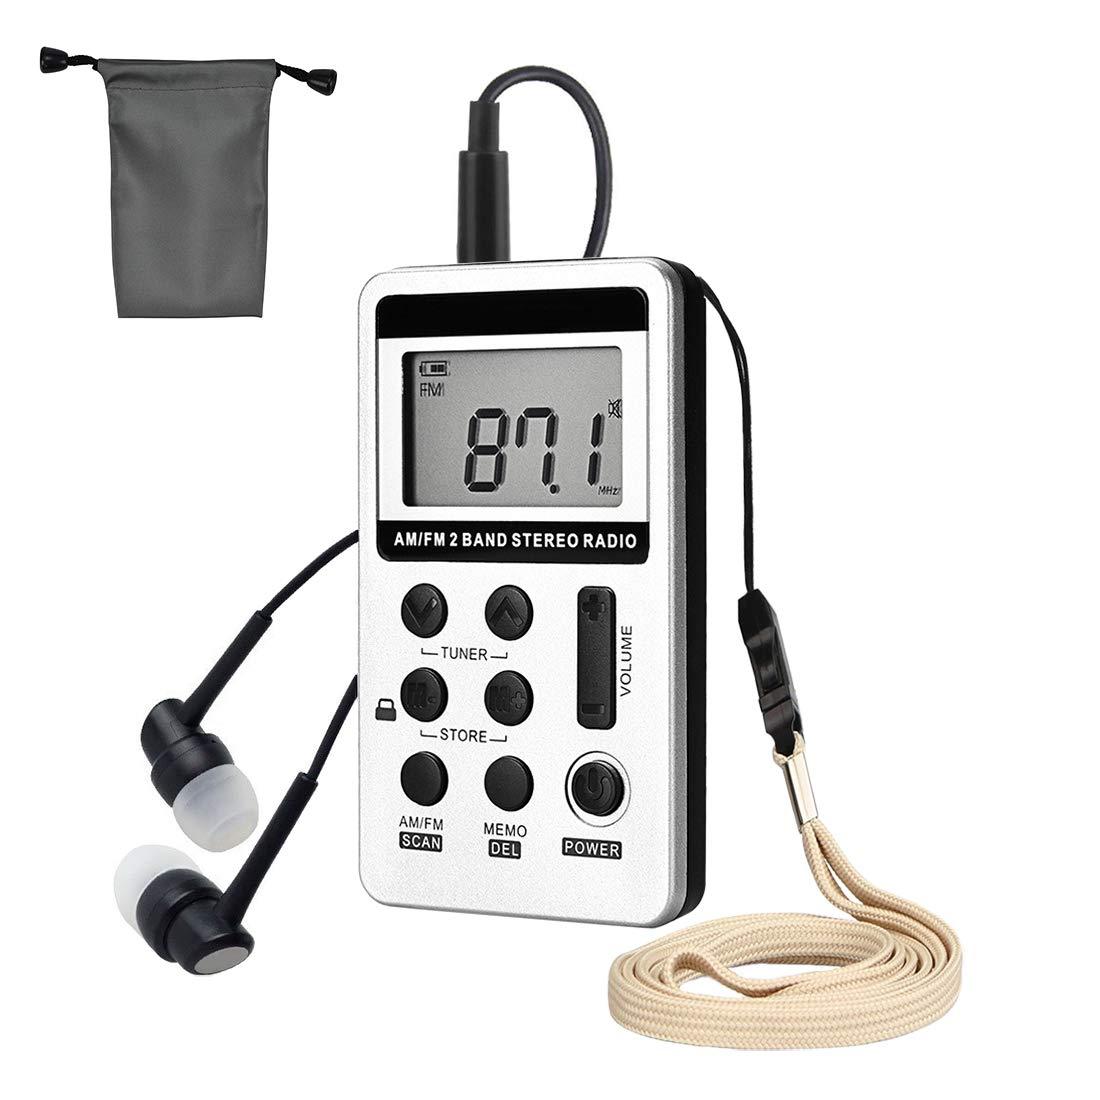 Mini Radio, Pocket Radio AM FM, Rechargeable Radio Portable, Digital Tuning Compact Radio with LCD Display&Earphone&Protective Bag (Silver)